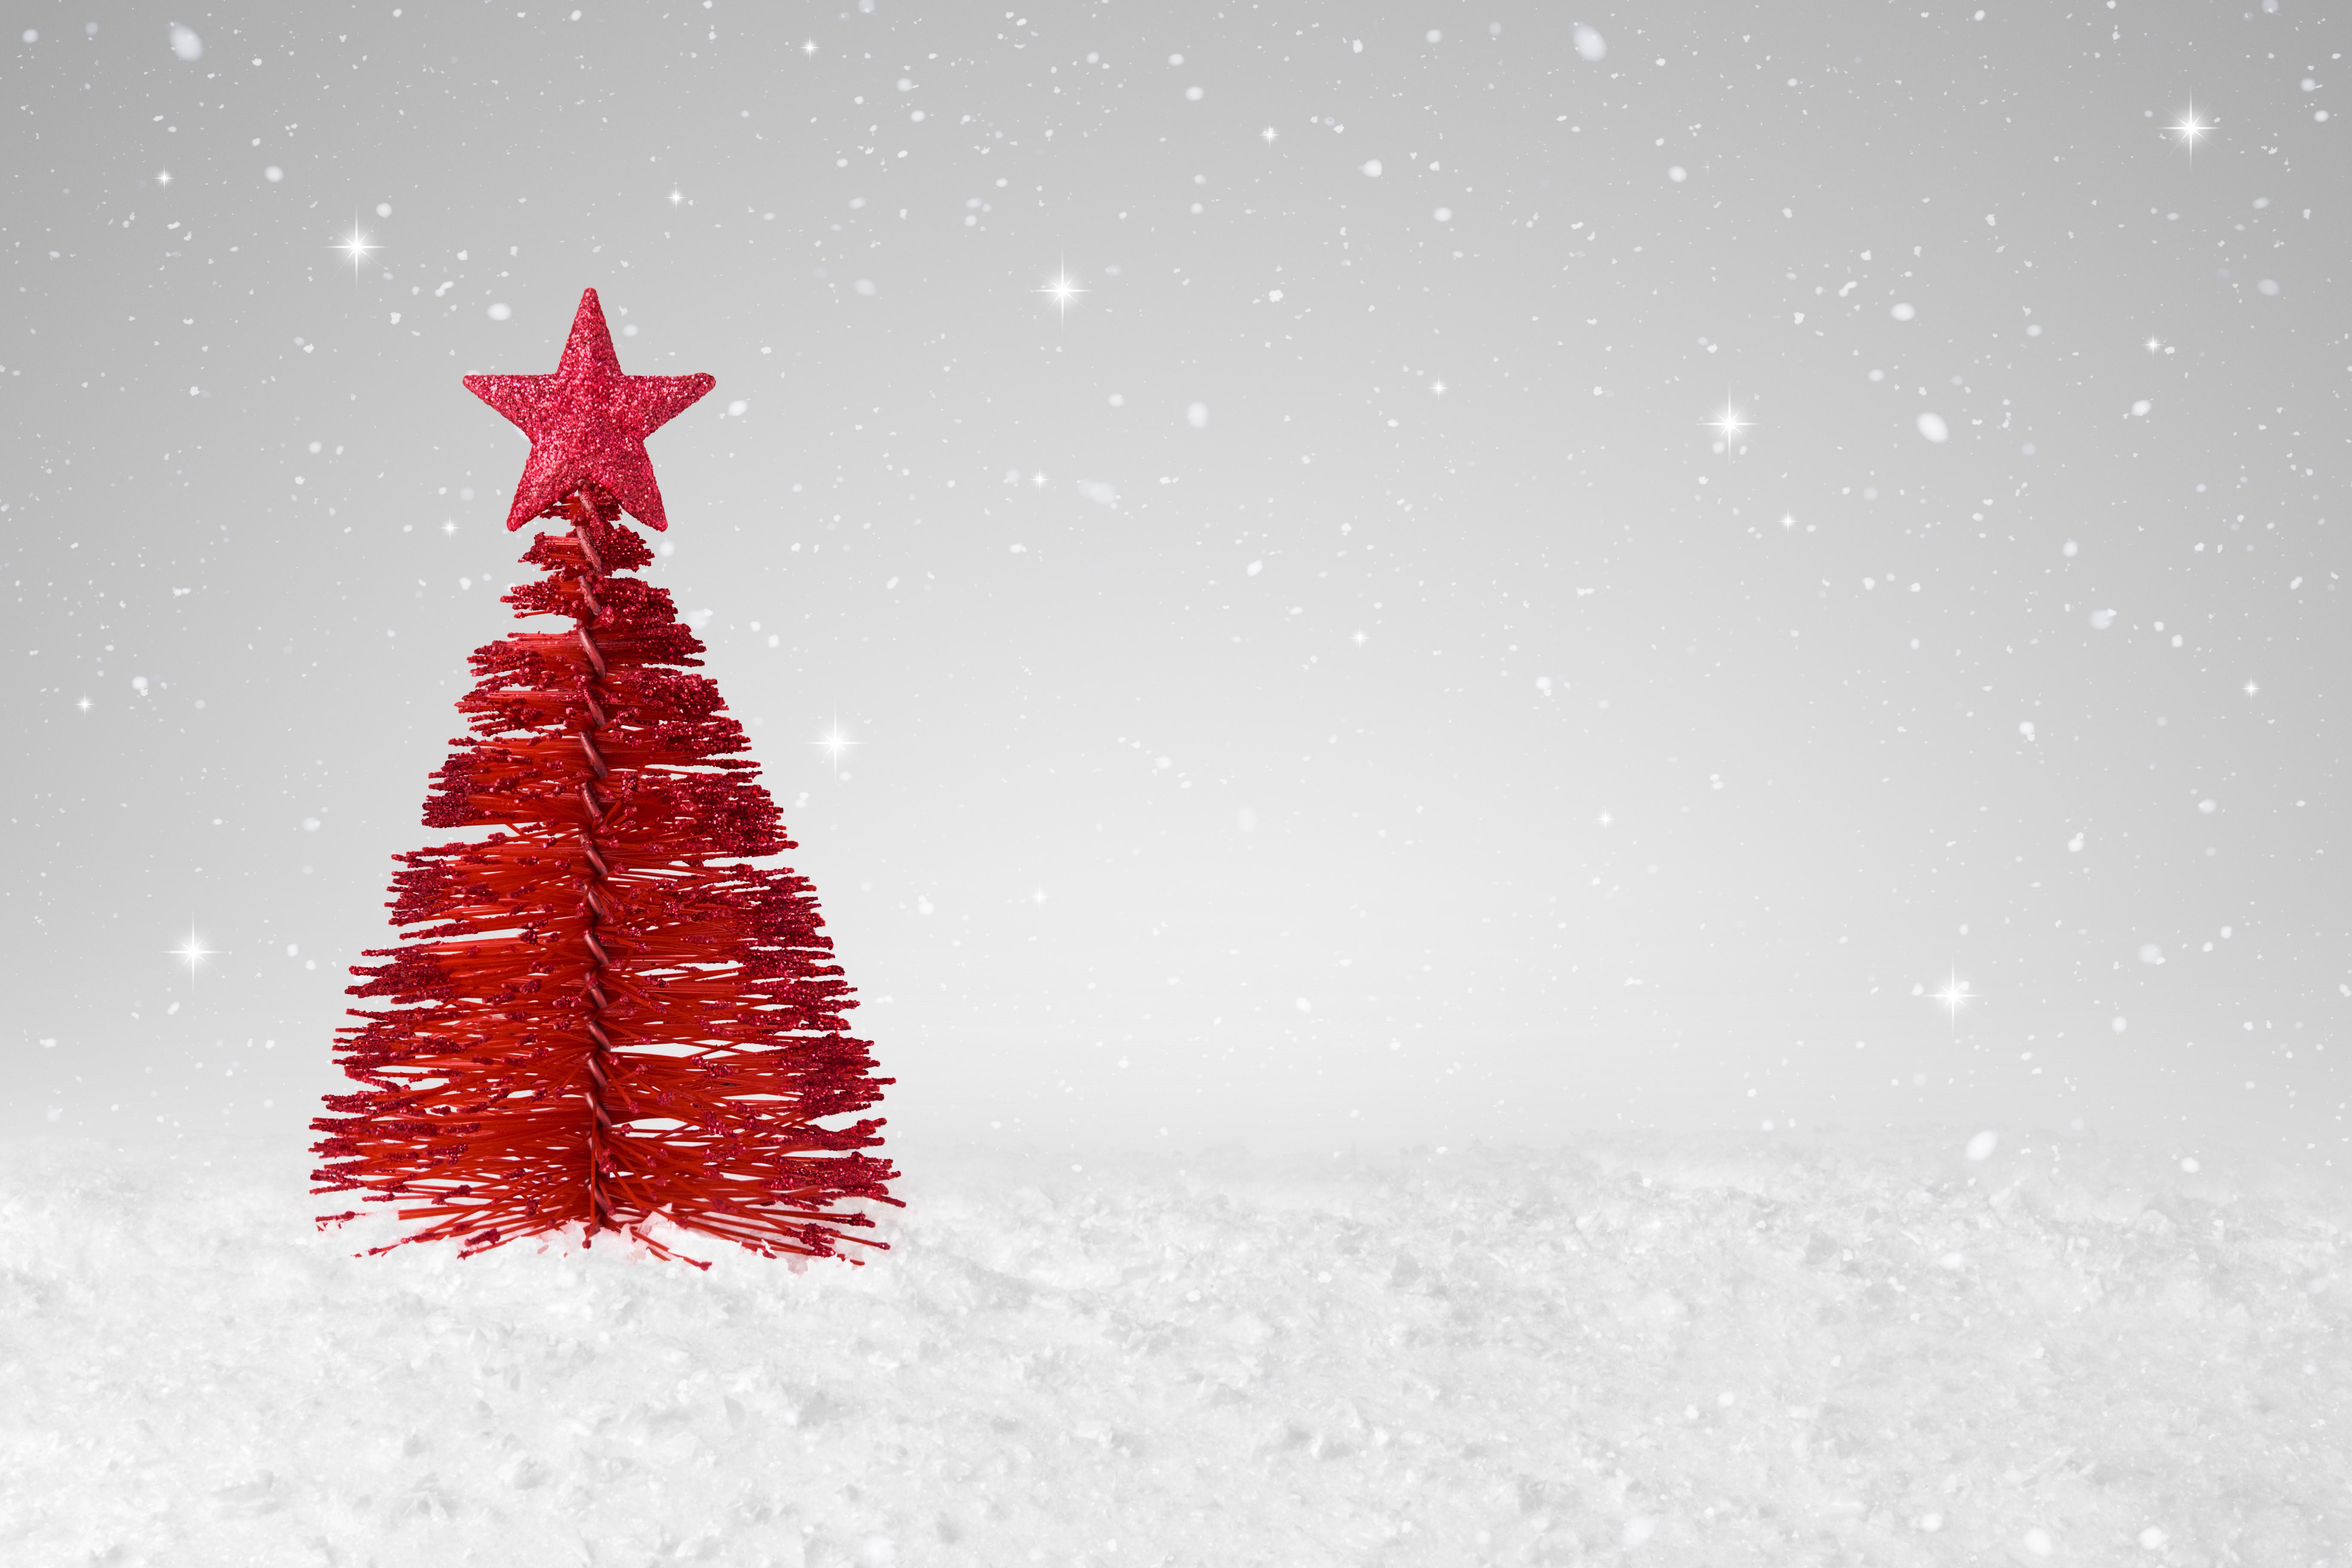 Asbestos At Christmas – Fake Snow